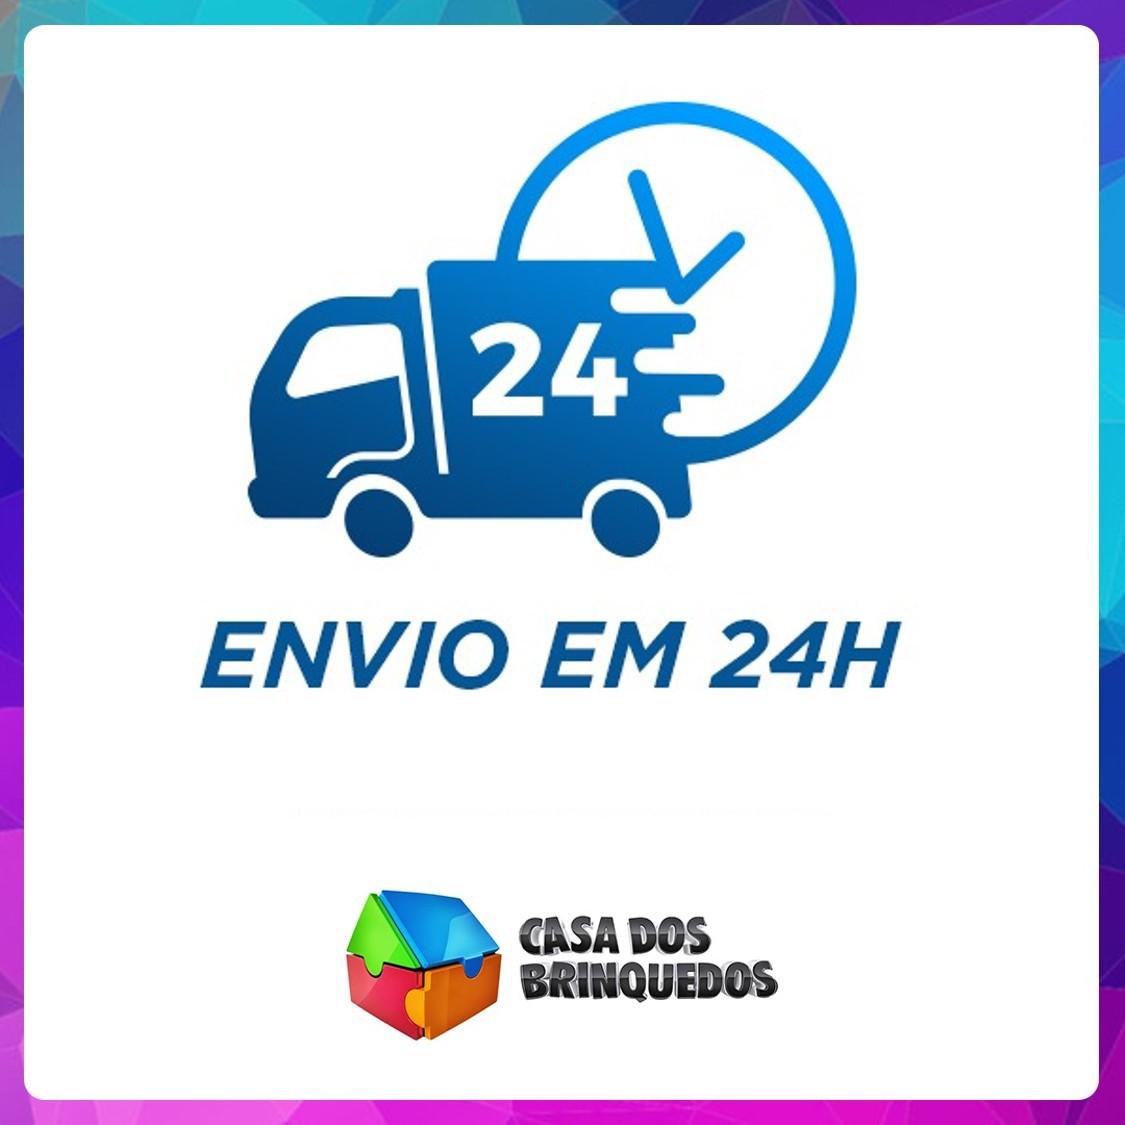 MÁSCARA CAPITÃO AMERICA VALUE AVENGERS MARVEL B0440 HASBRO